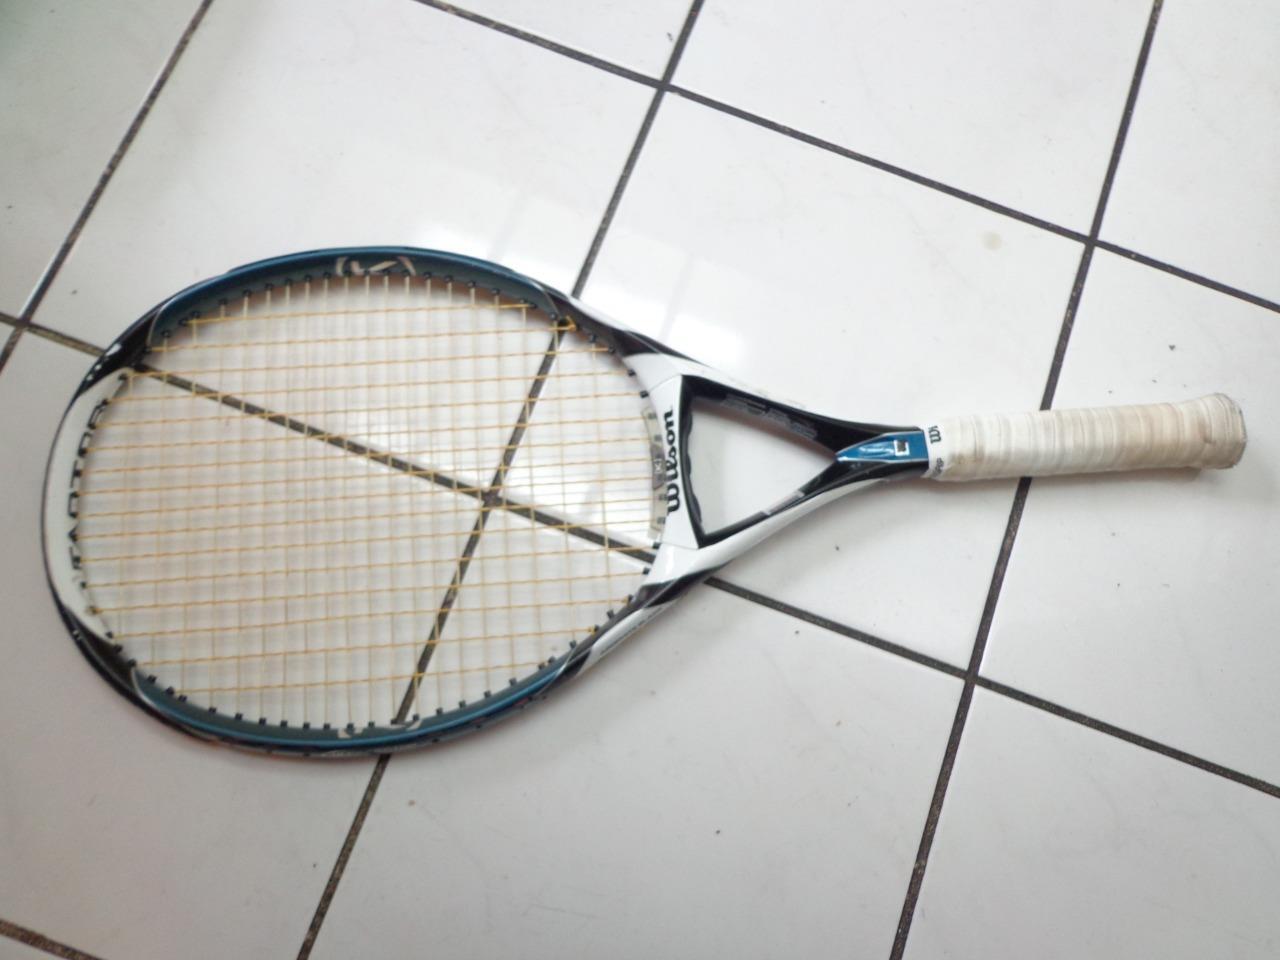 Wilson K Factor 4 112 cabeza 4 1 2 Grip Tenis Raqueta